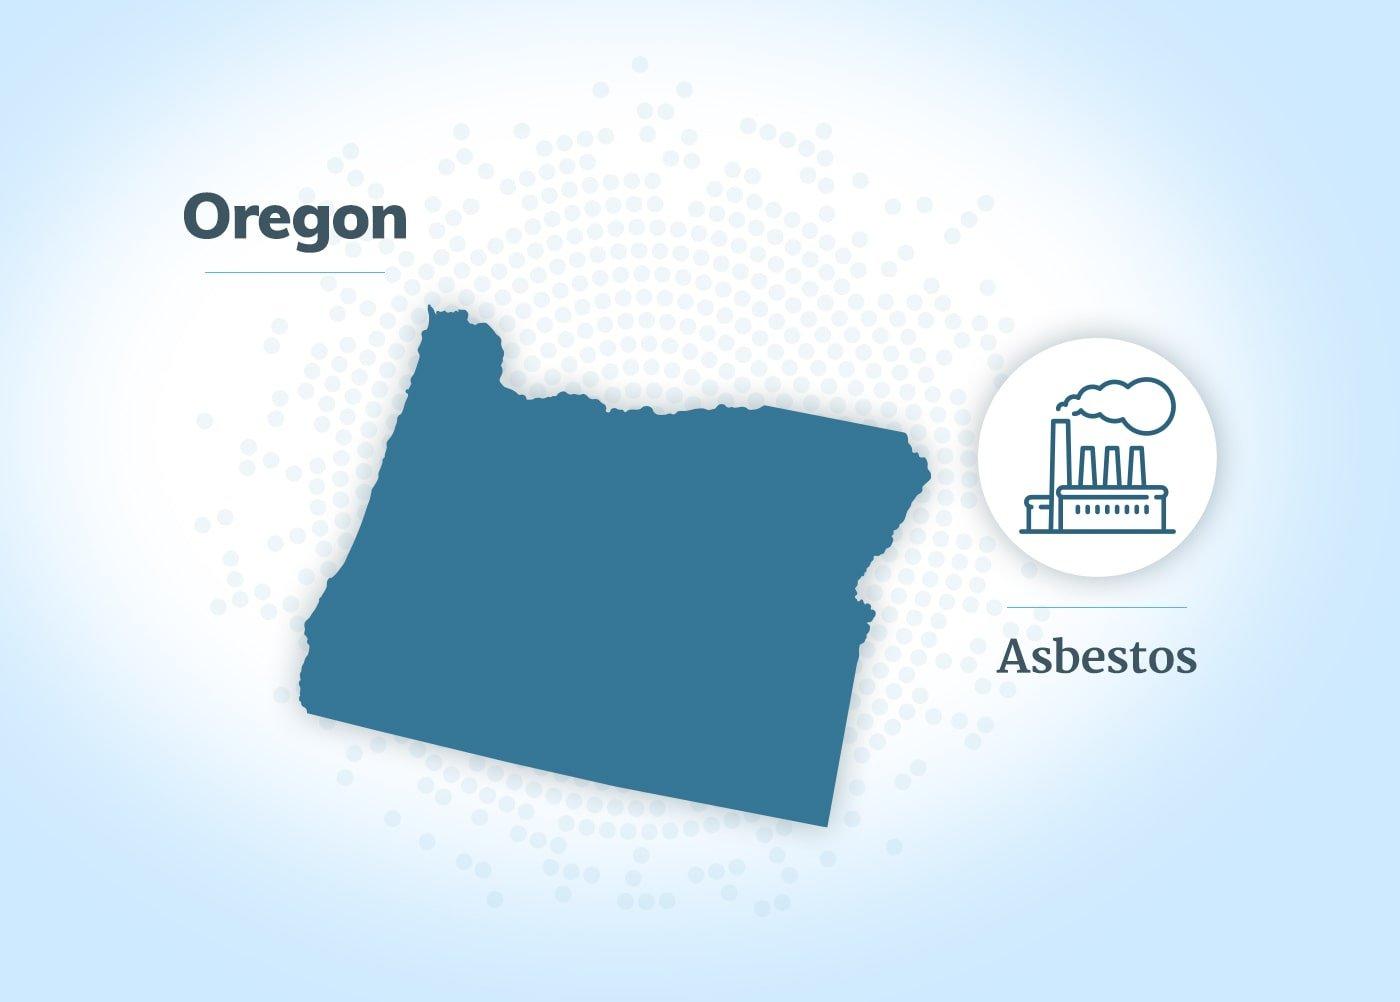 Asbestos exposure in Oregon